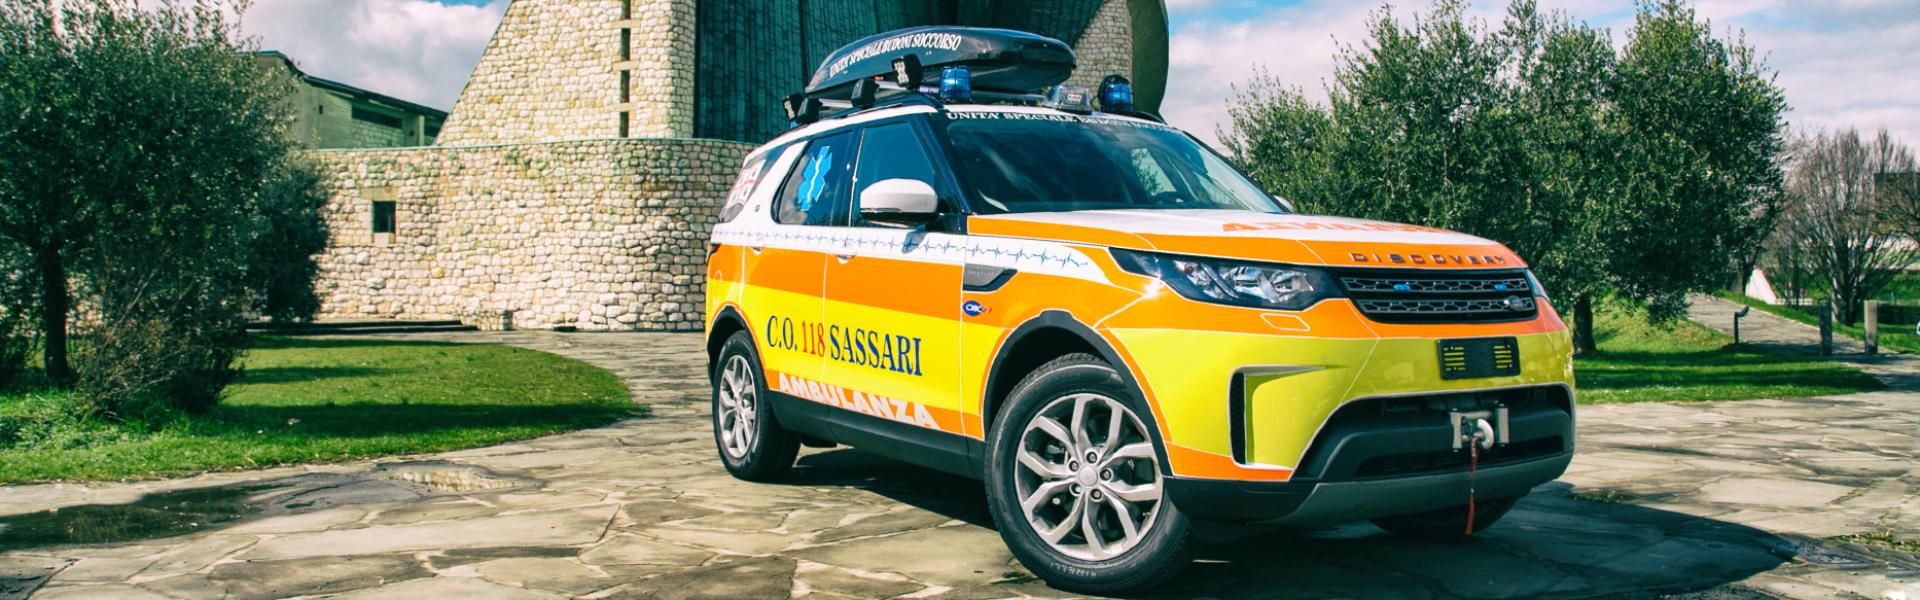 Ambulanze da trasporto per servizi sanitari